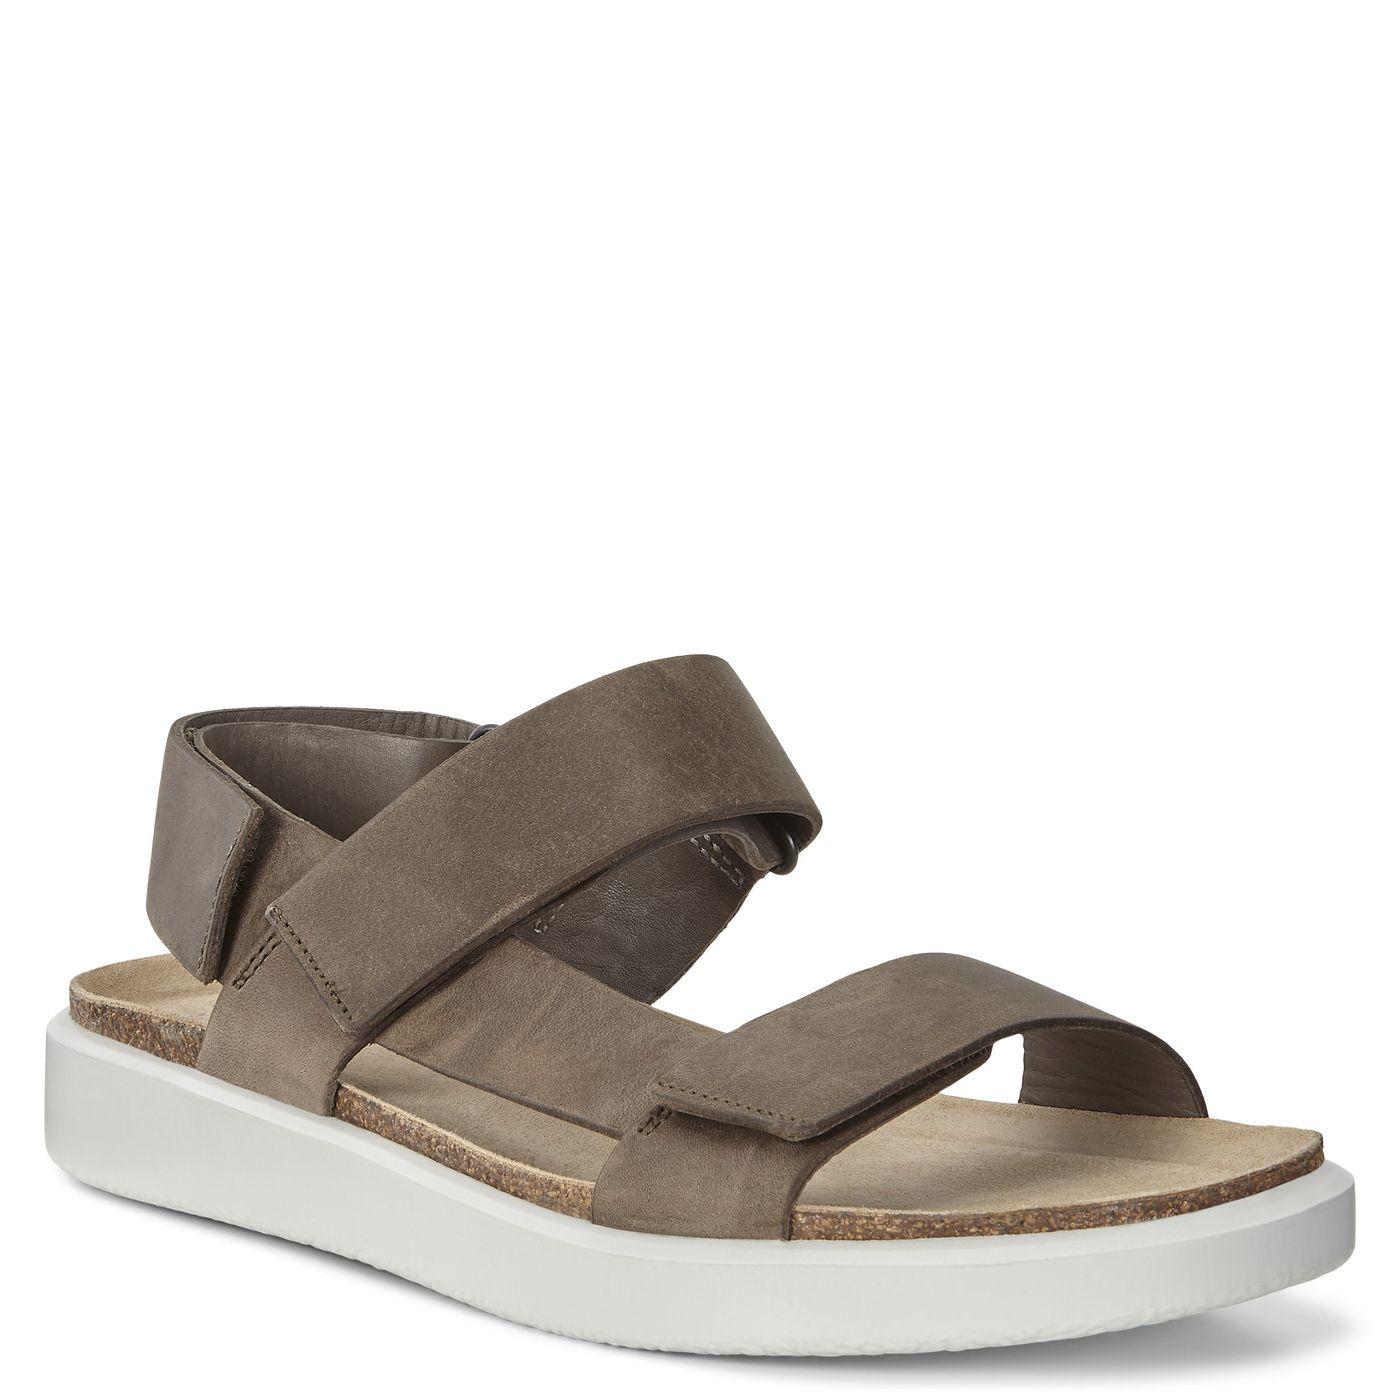 ECCO Corksphere Sandal Flat | Men's Casual Sandals | ECCO